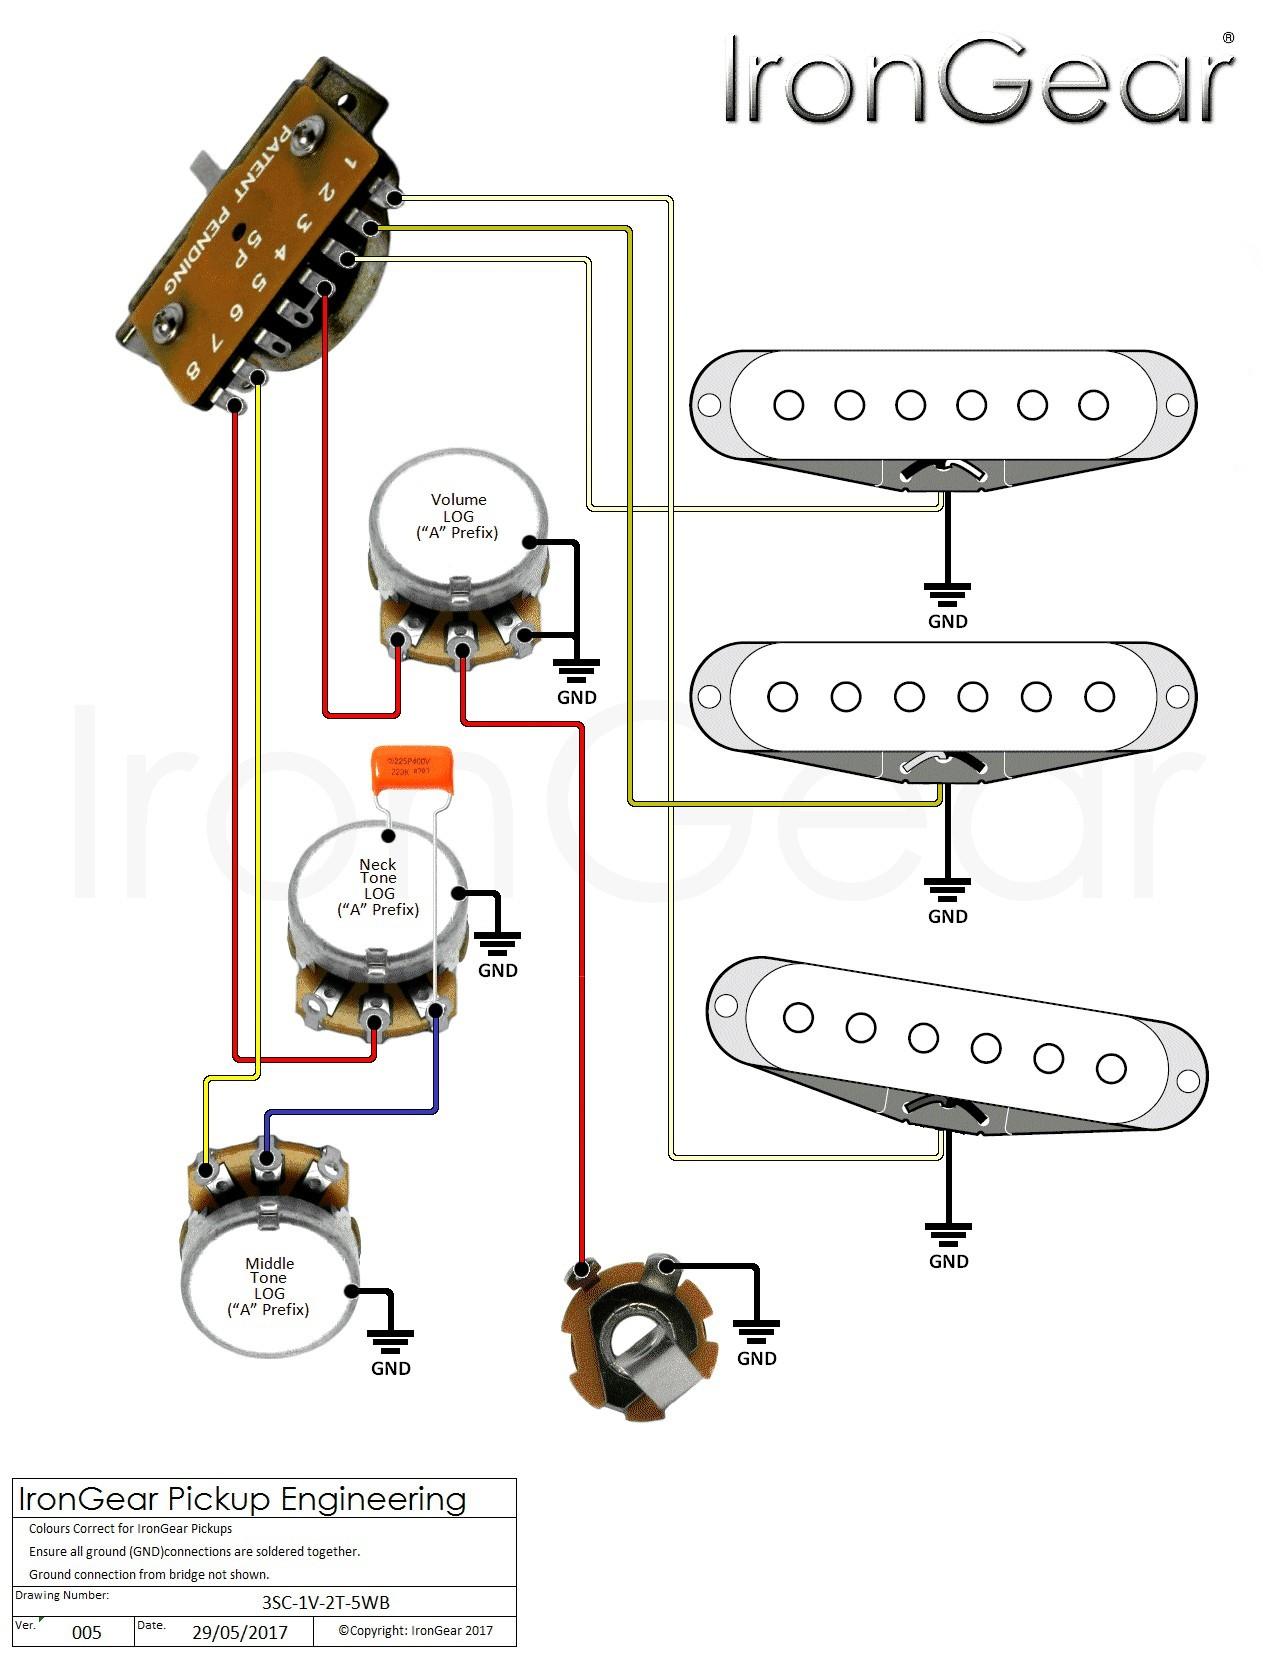 Guitar wiring diagrams 2 pickups electric guitar wiring diagram e guitar wiring diagrams 2 pickups electric guitar wiring diagram e pickup new guitar wiring diagrams of swarovskicordoba Image collections